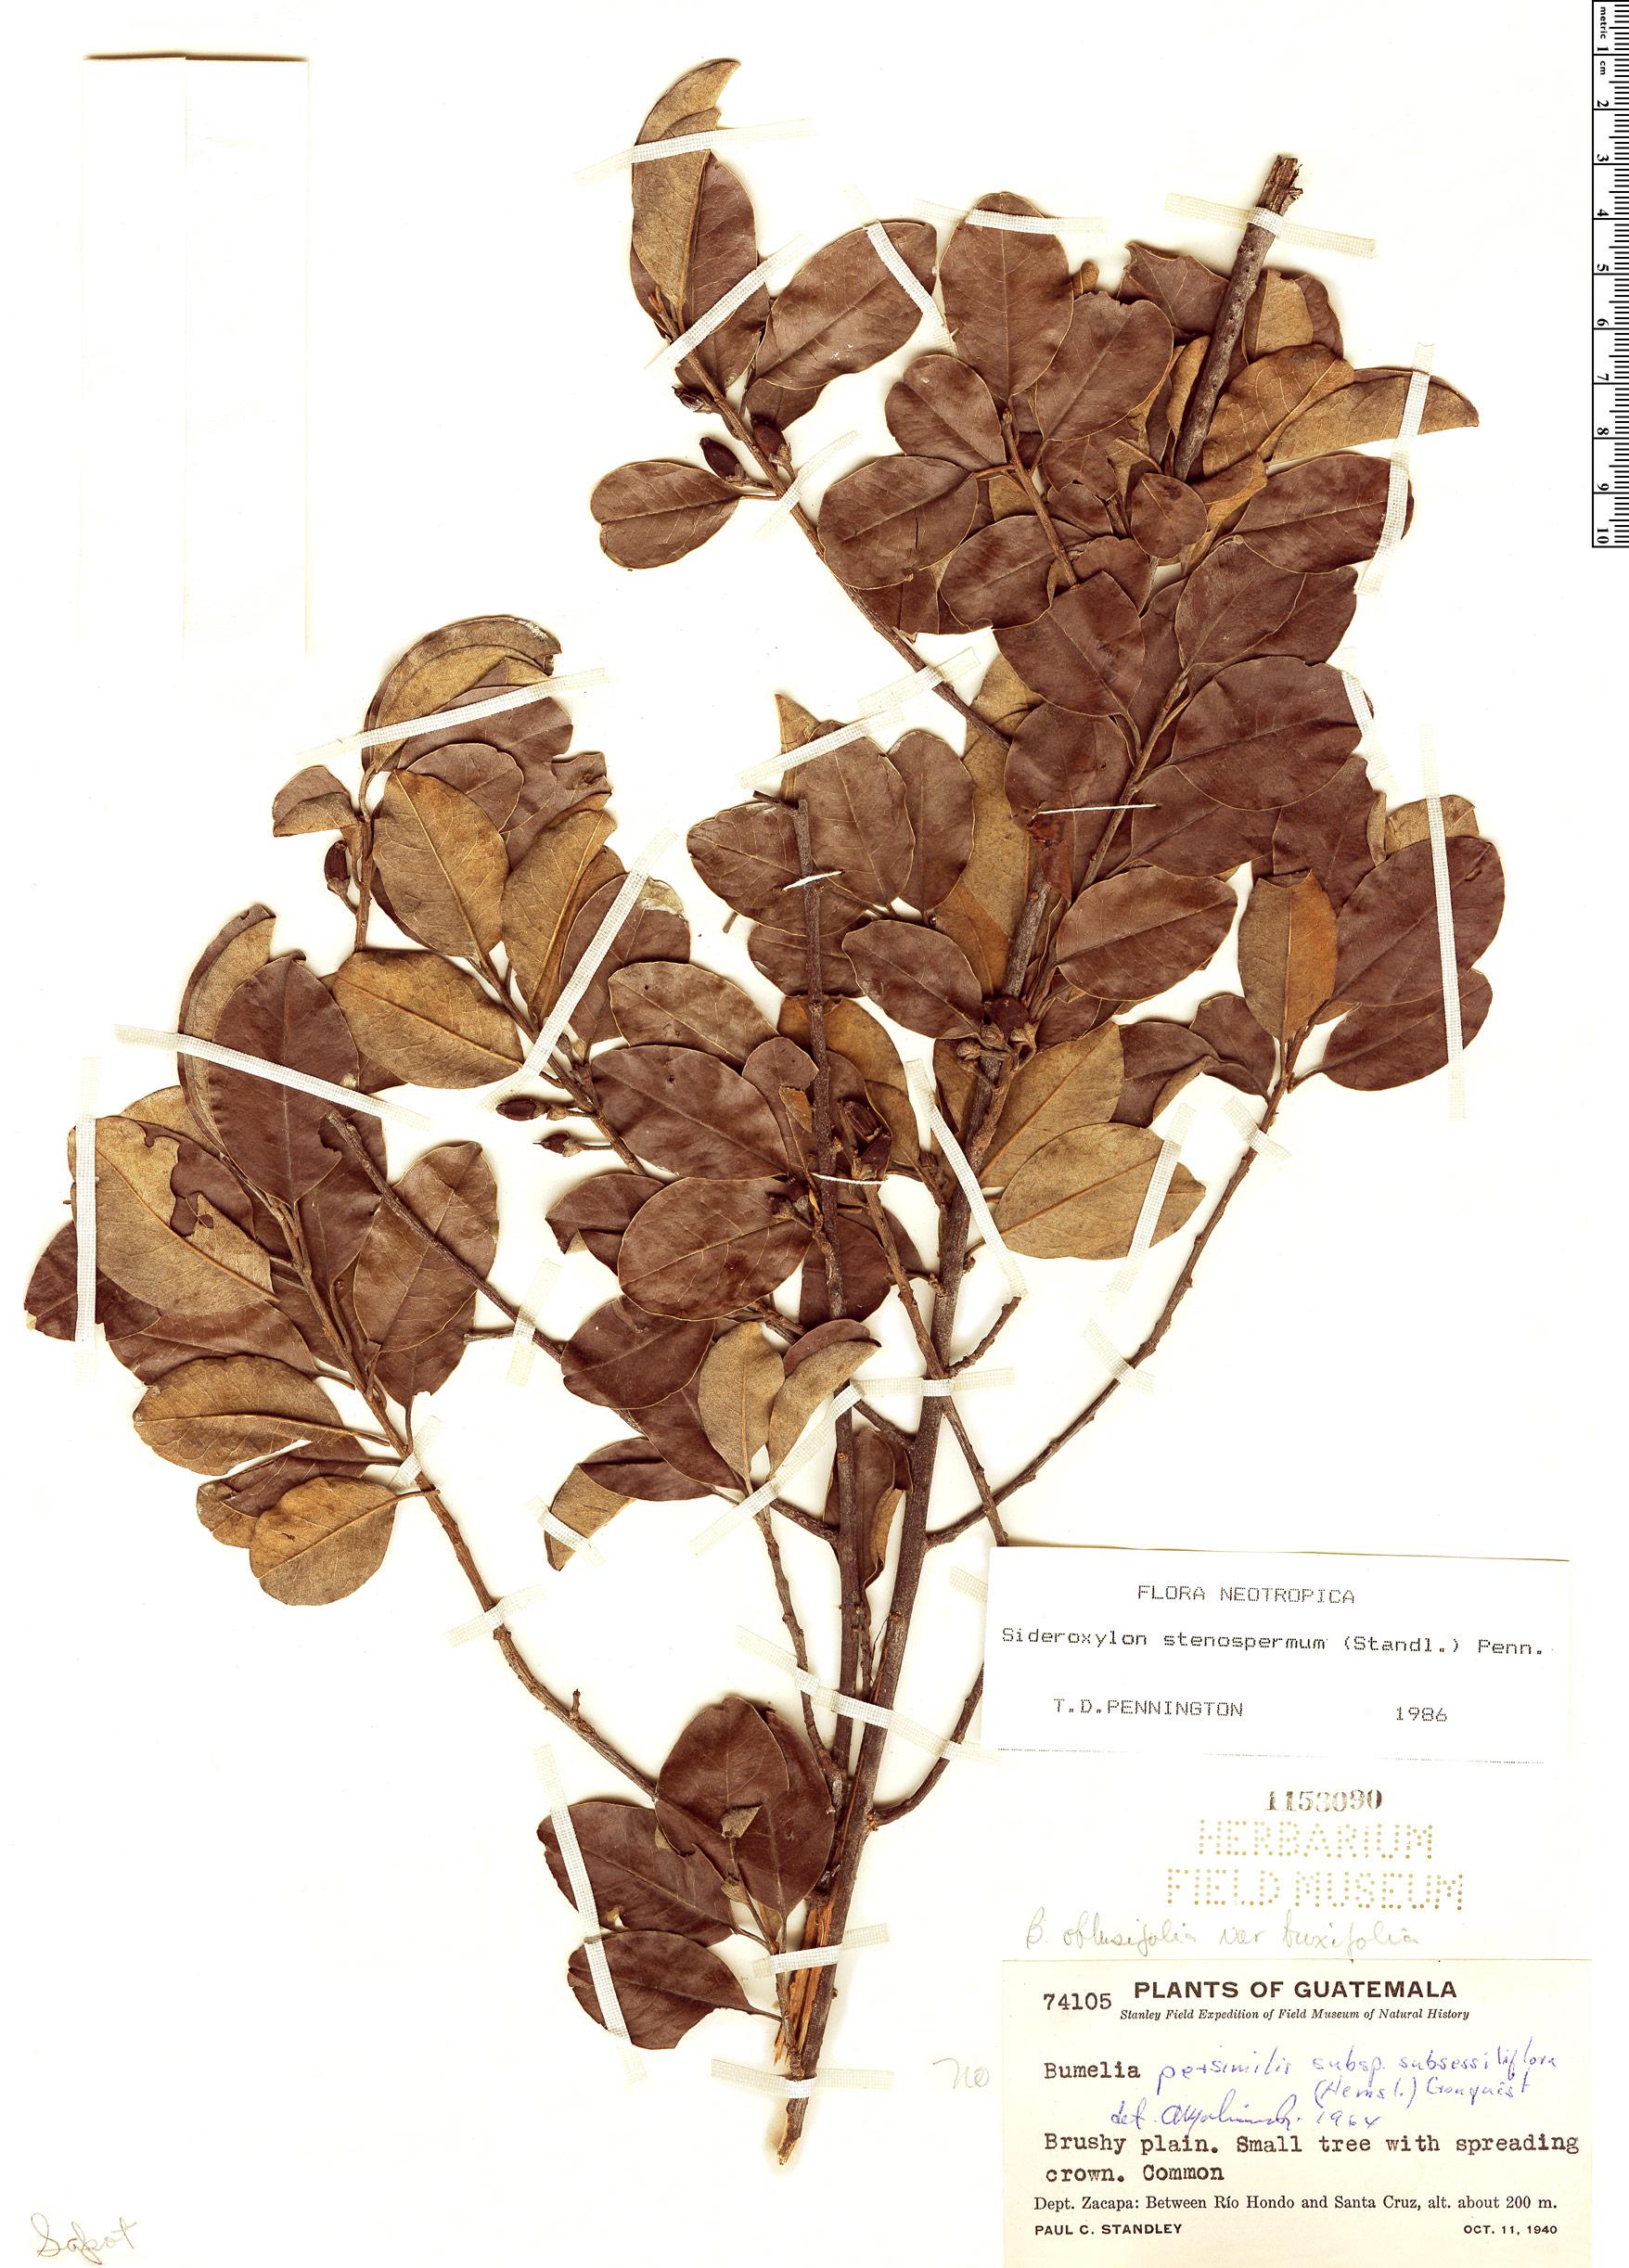 Specimen: Sideroxylon stenospermum